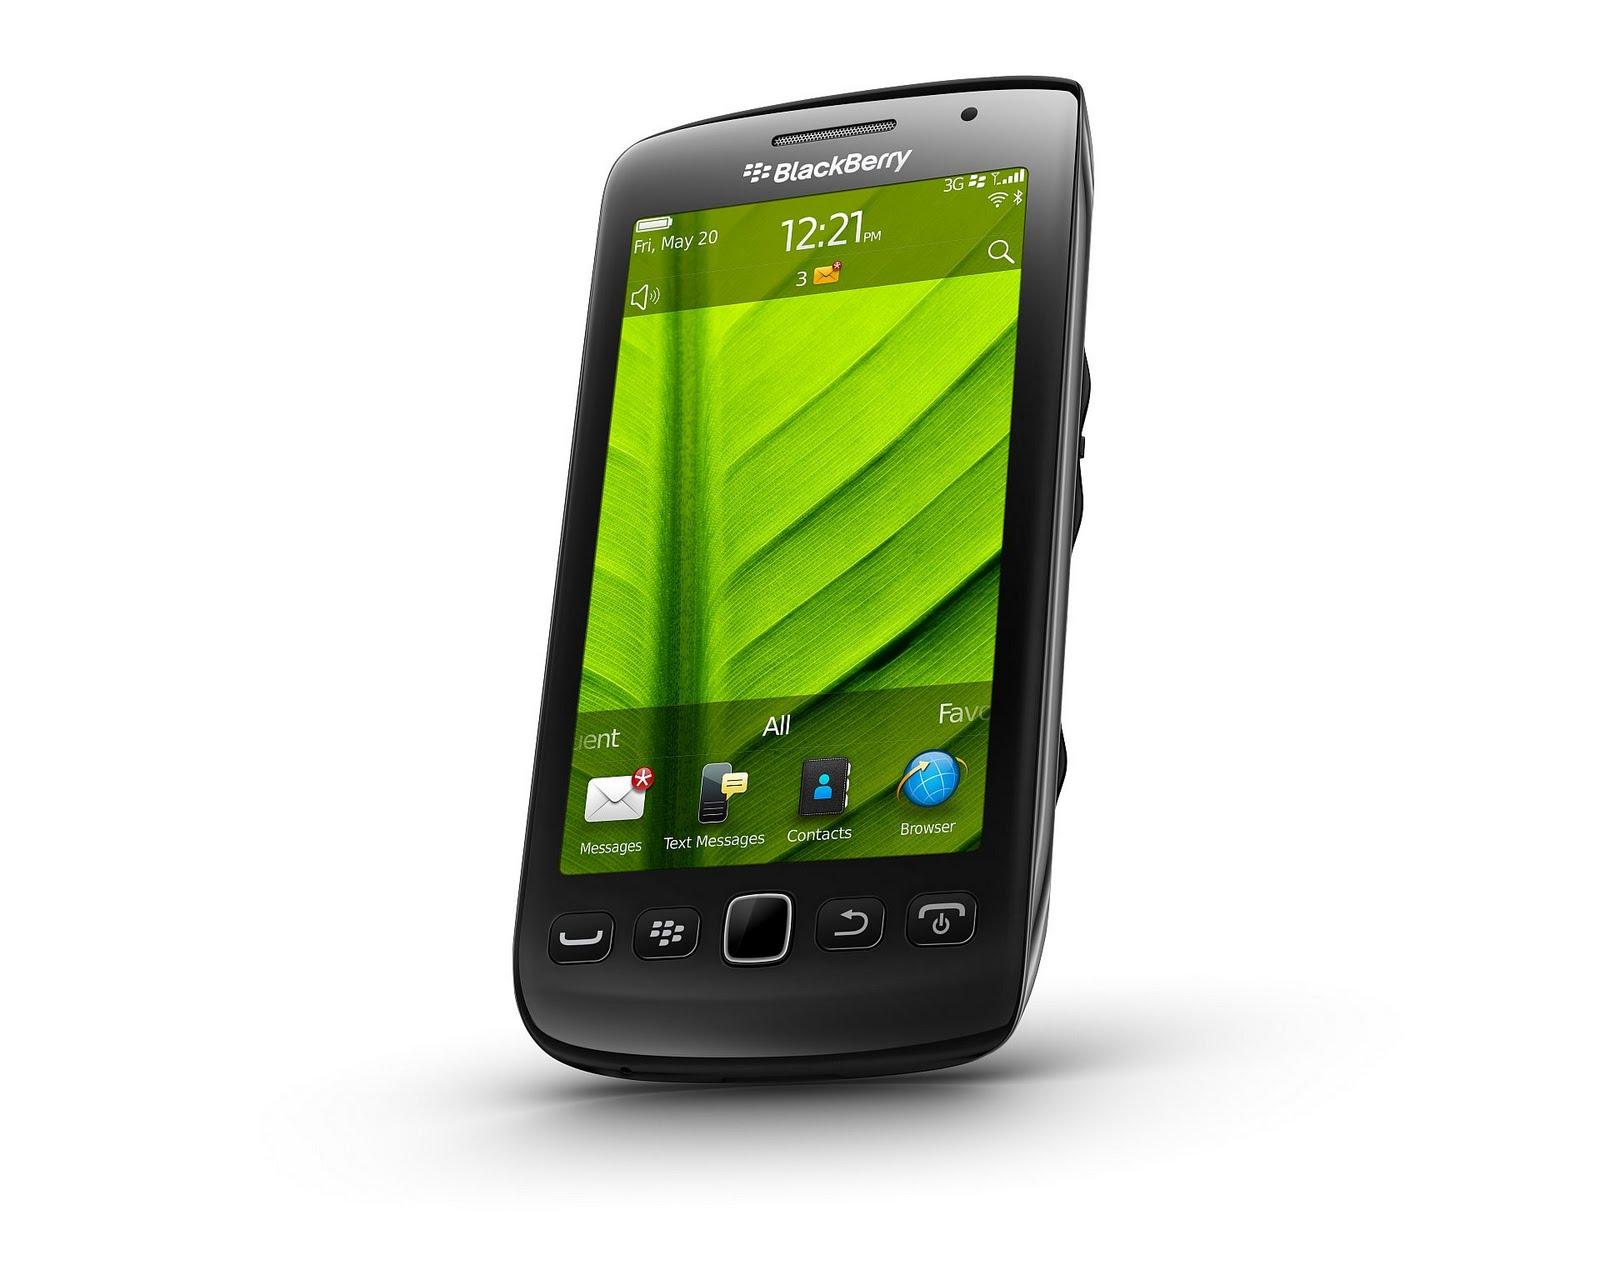 http://1.bp.blogspot.com/-6-02x_LRK2U/TjkeFNTgcJI/AAAAAAAAIiY/B7p5kxGE2fE/s1600/Blackberry+Torch+9860-9850.jpg